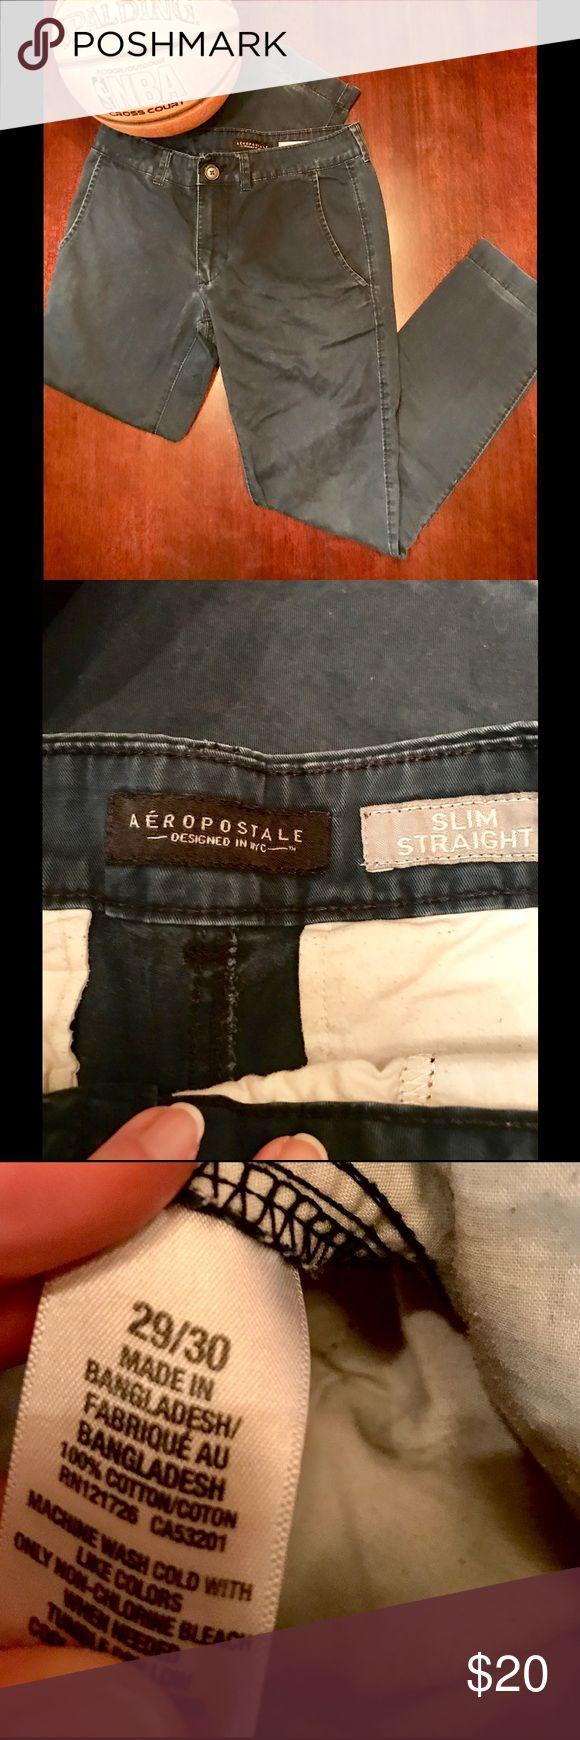 Aeropostale Men's Straight Slim Chino Pants Aeropostale Men's Straight Slim Chino Pants 29x30 Aeropostale Pants Chinos & Khakis